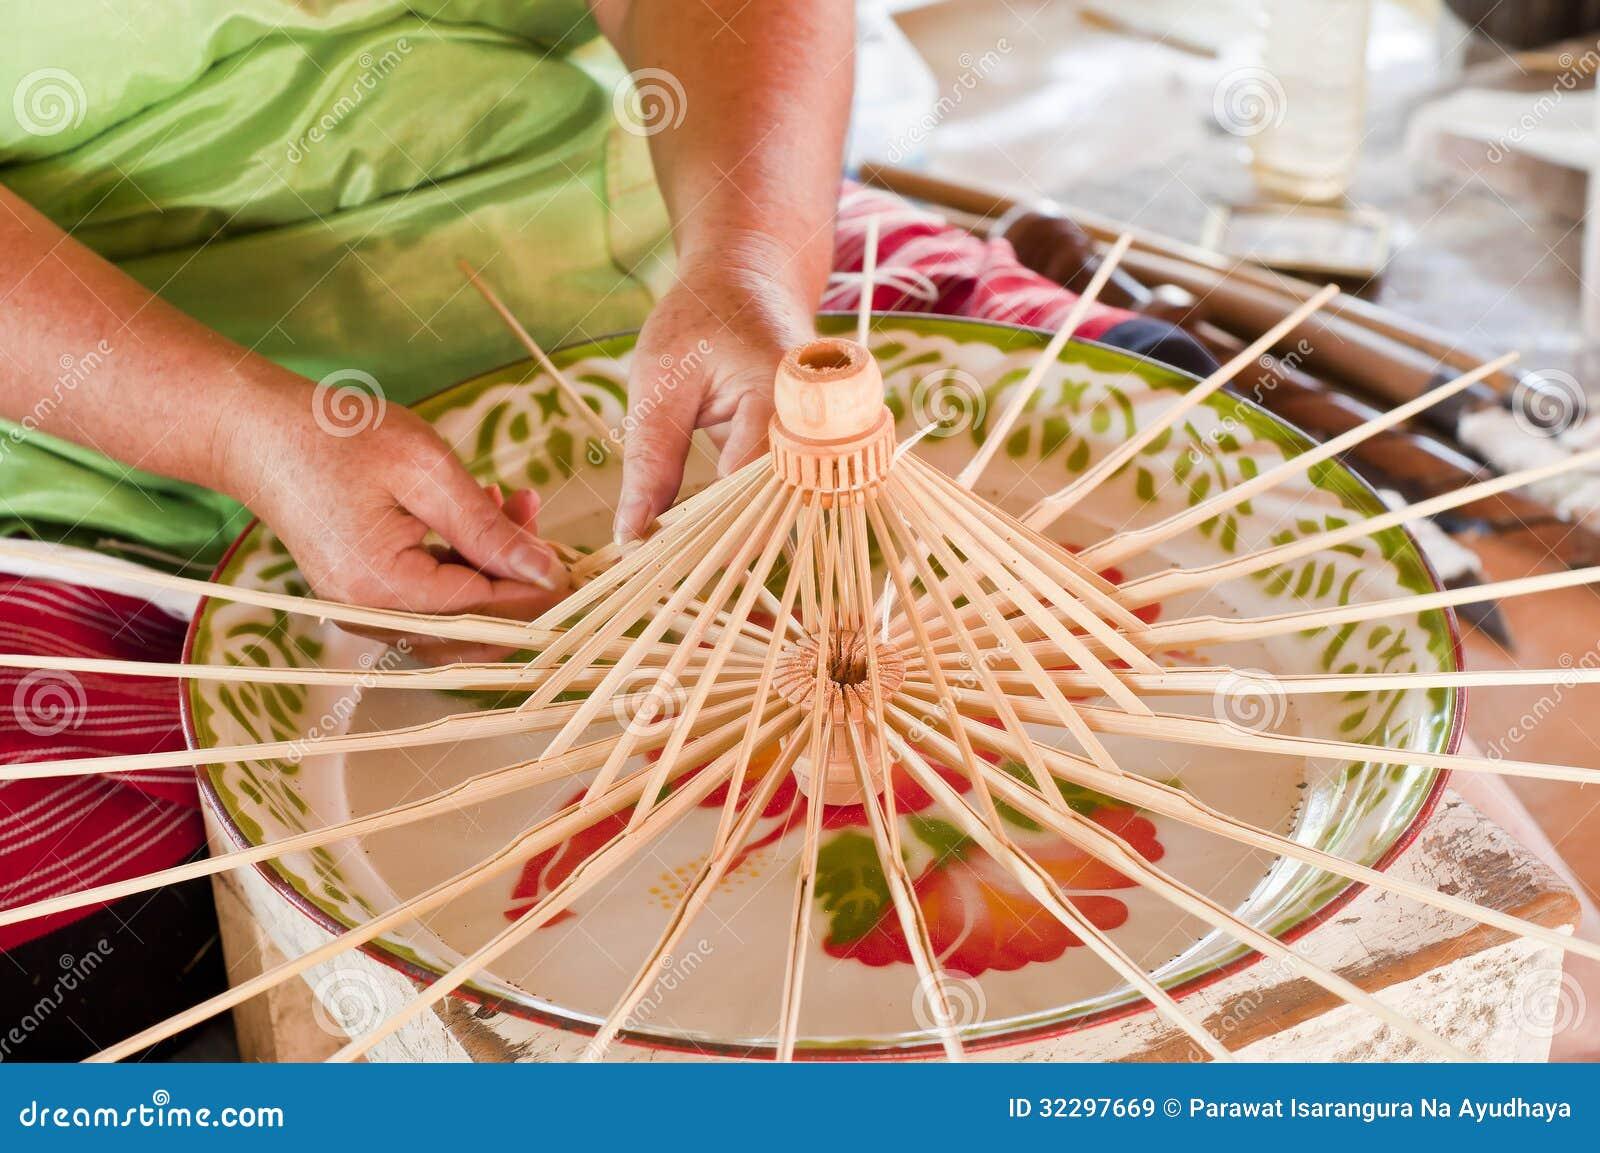 worker making bamboo umbrella frame